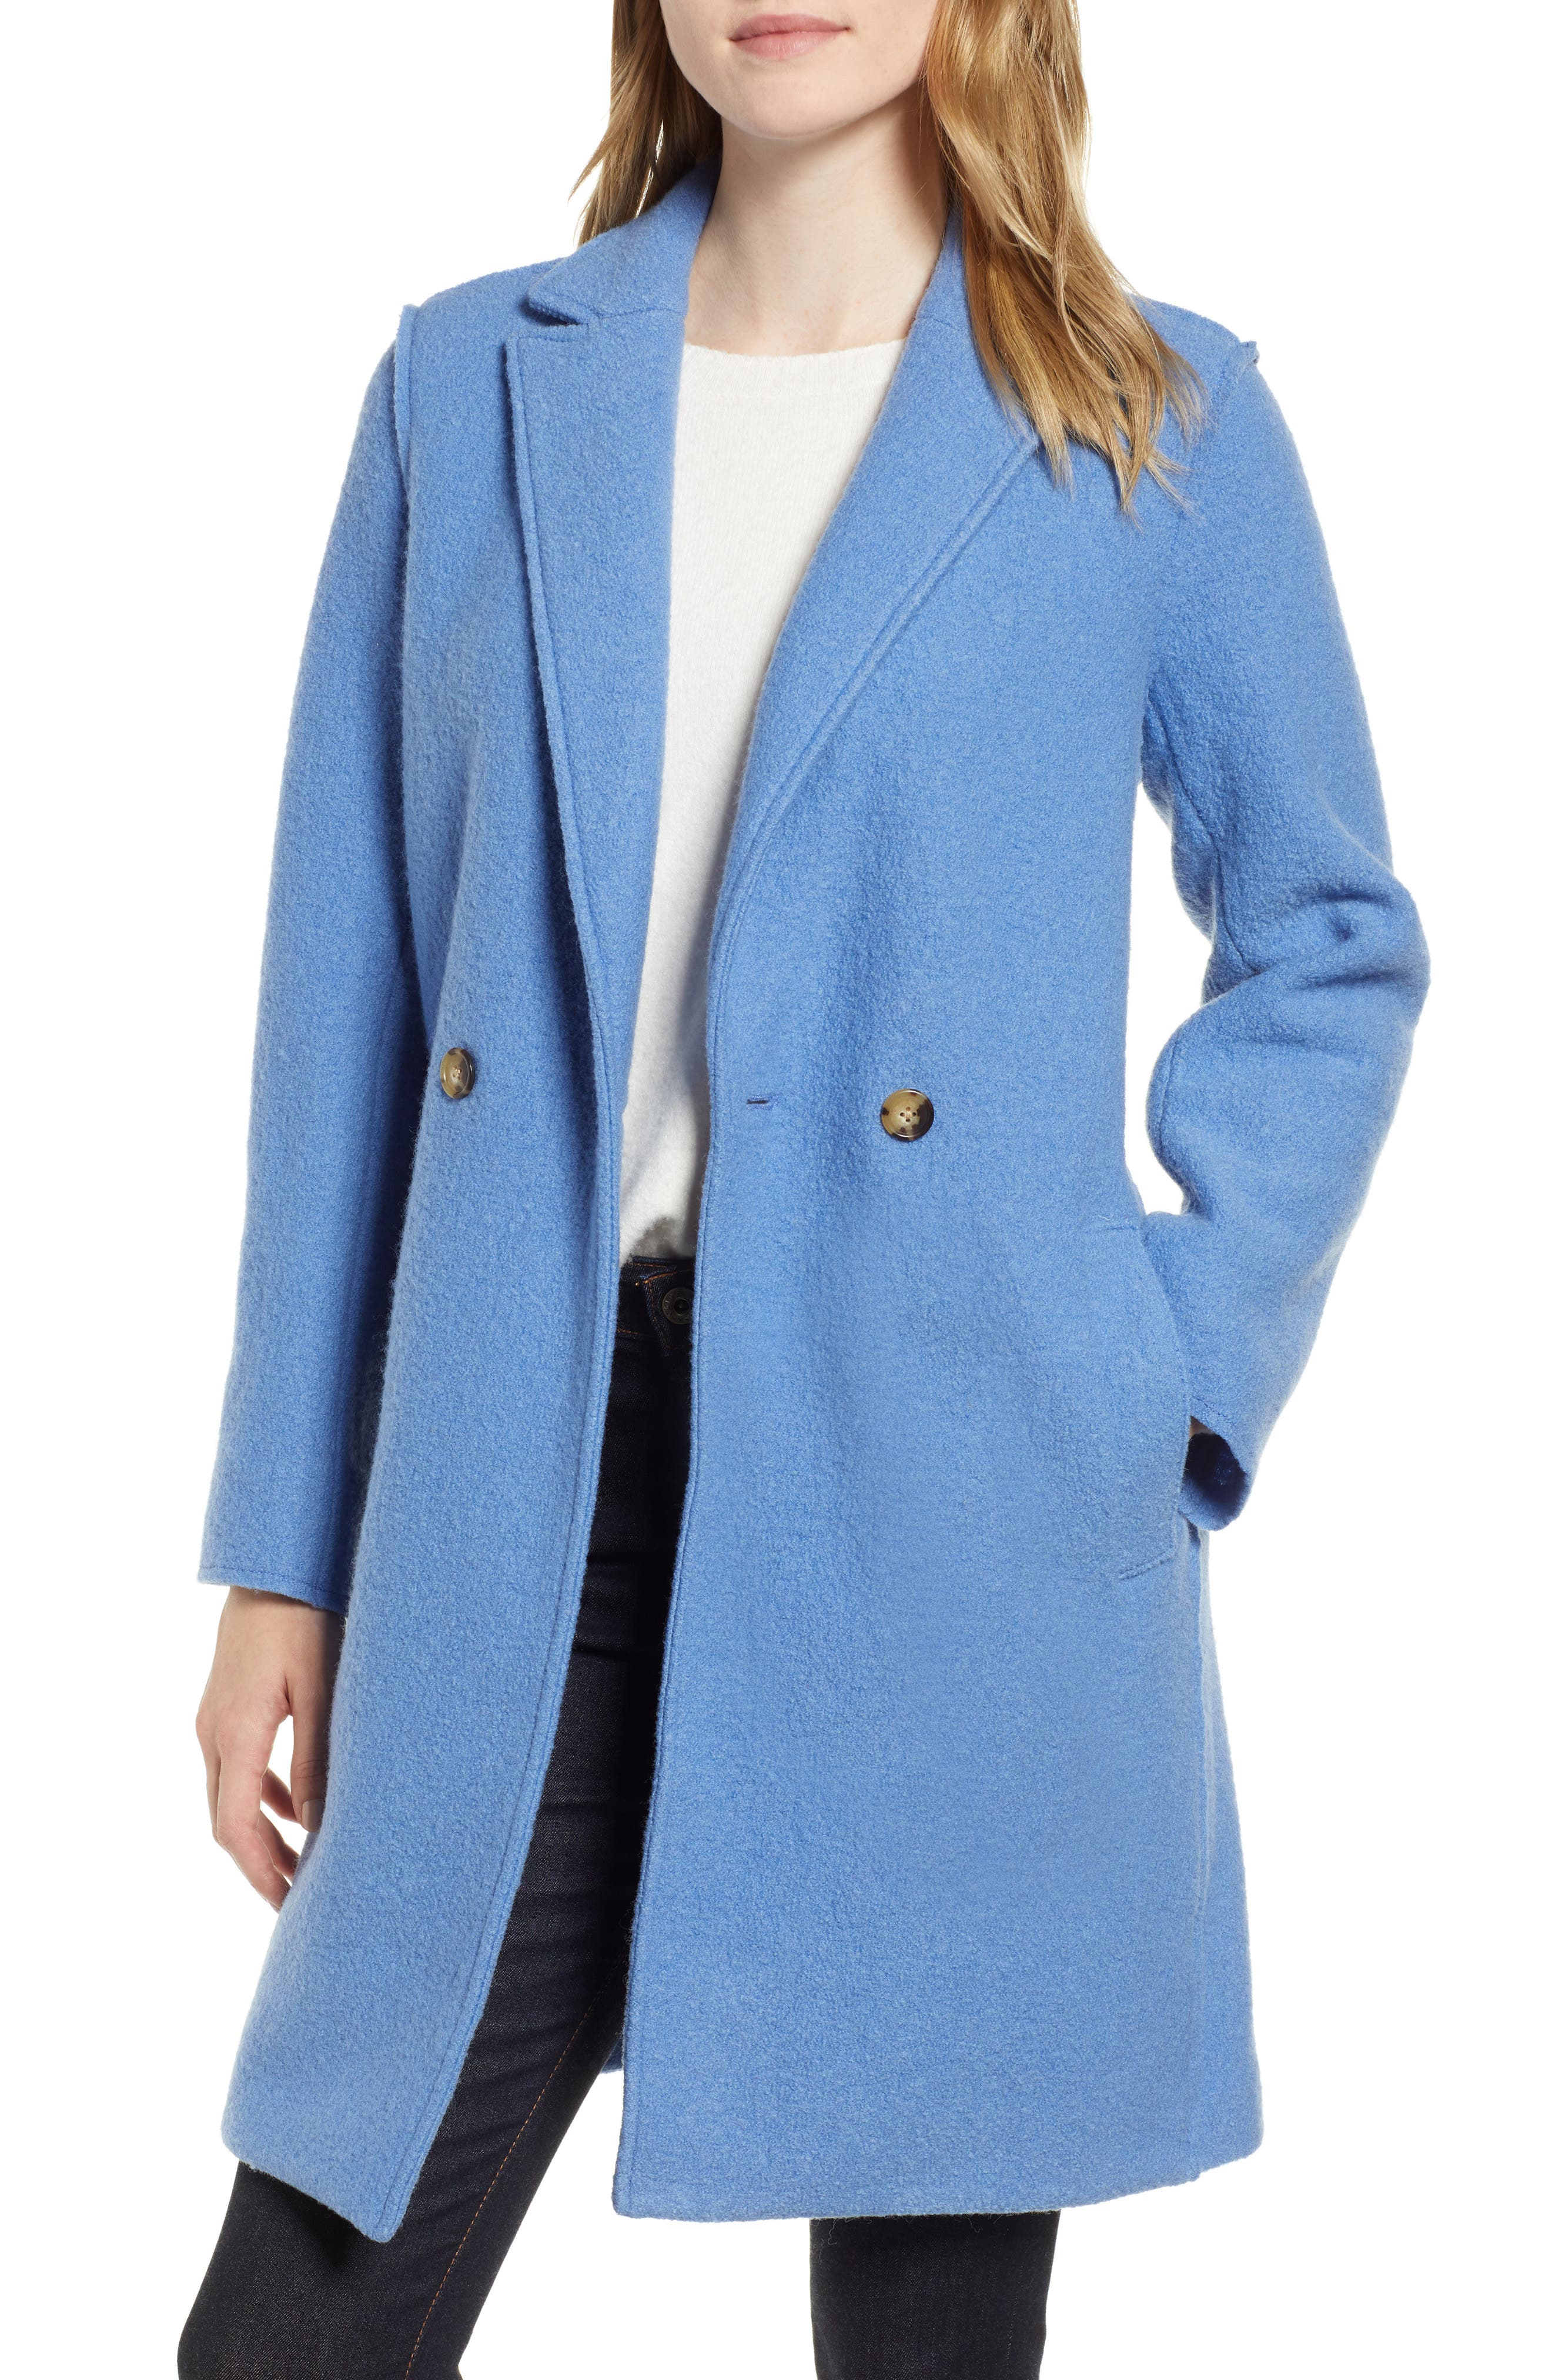 amp; Jackets Women's Length Coats Mid Nordstrom OqxgaY